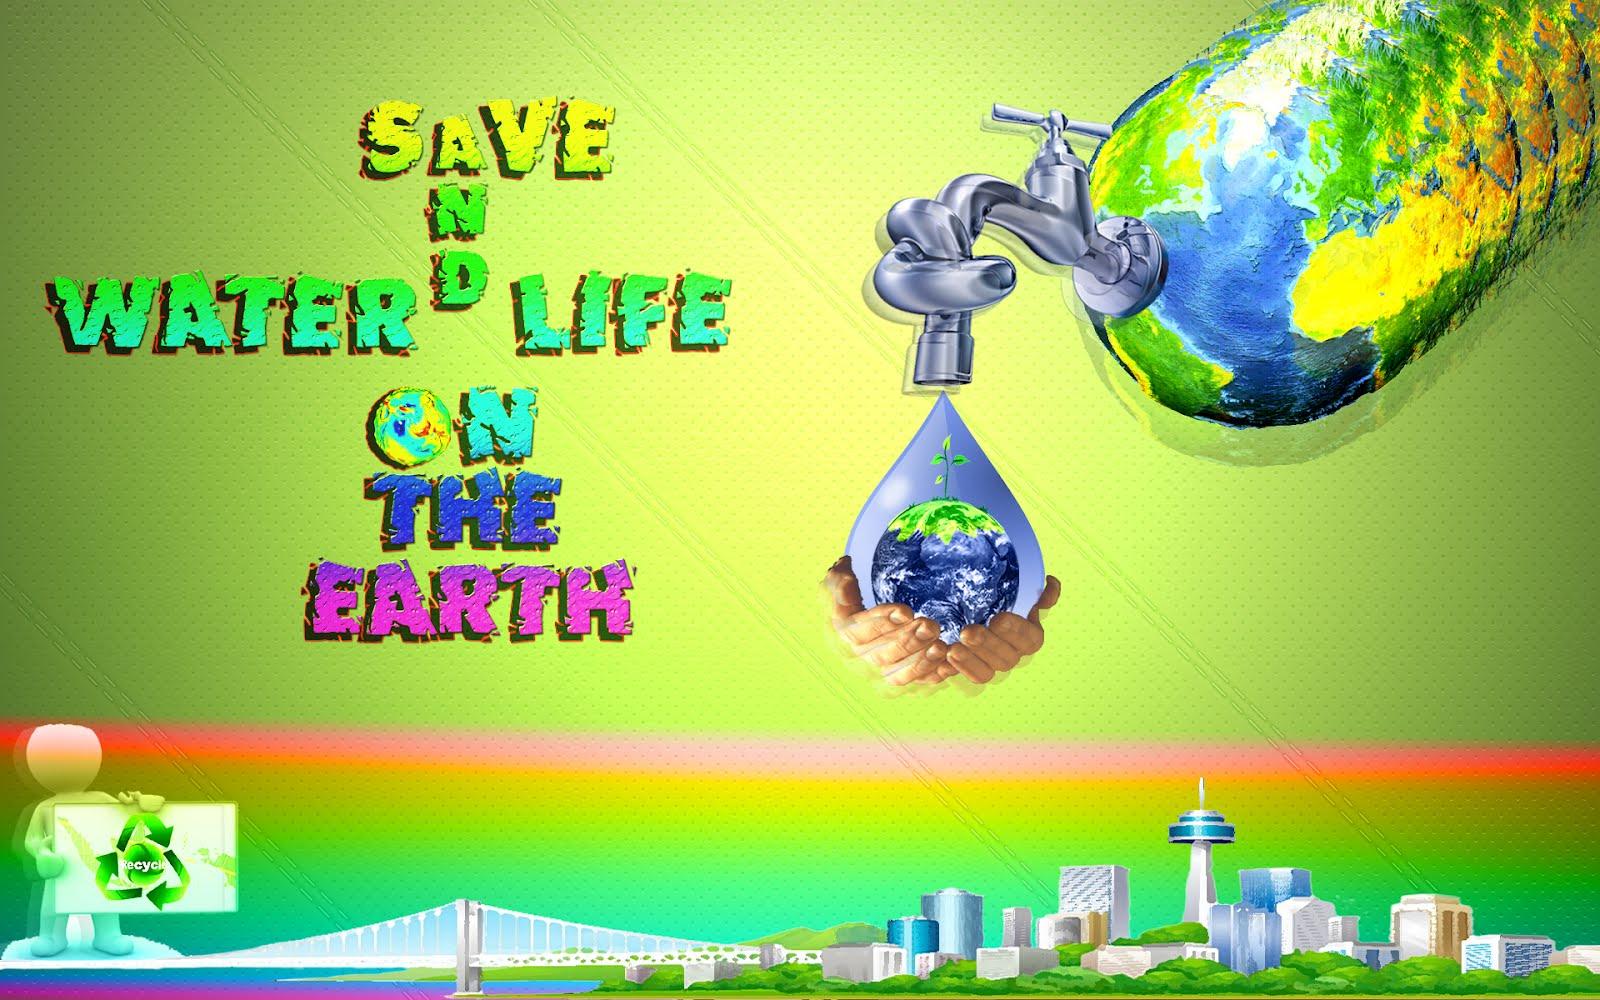 Save Water Save Life